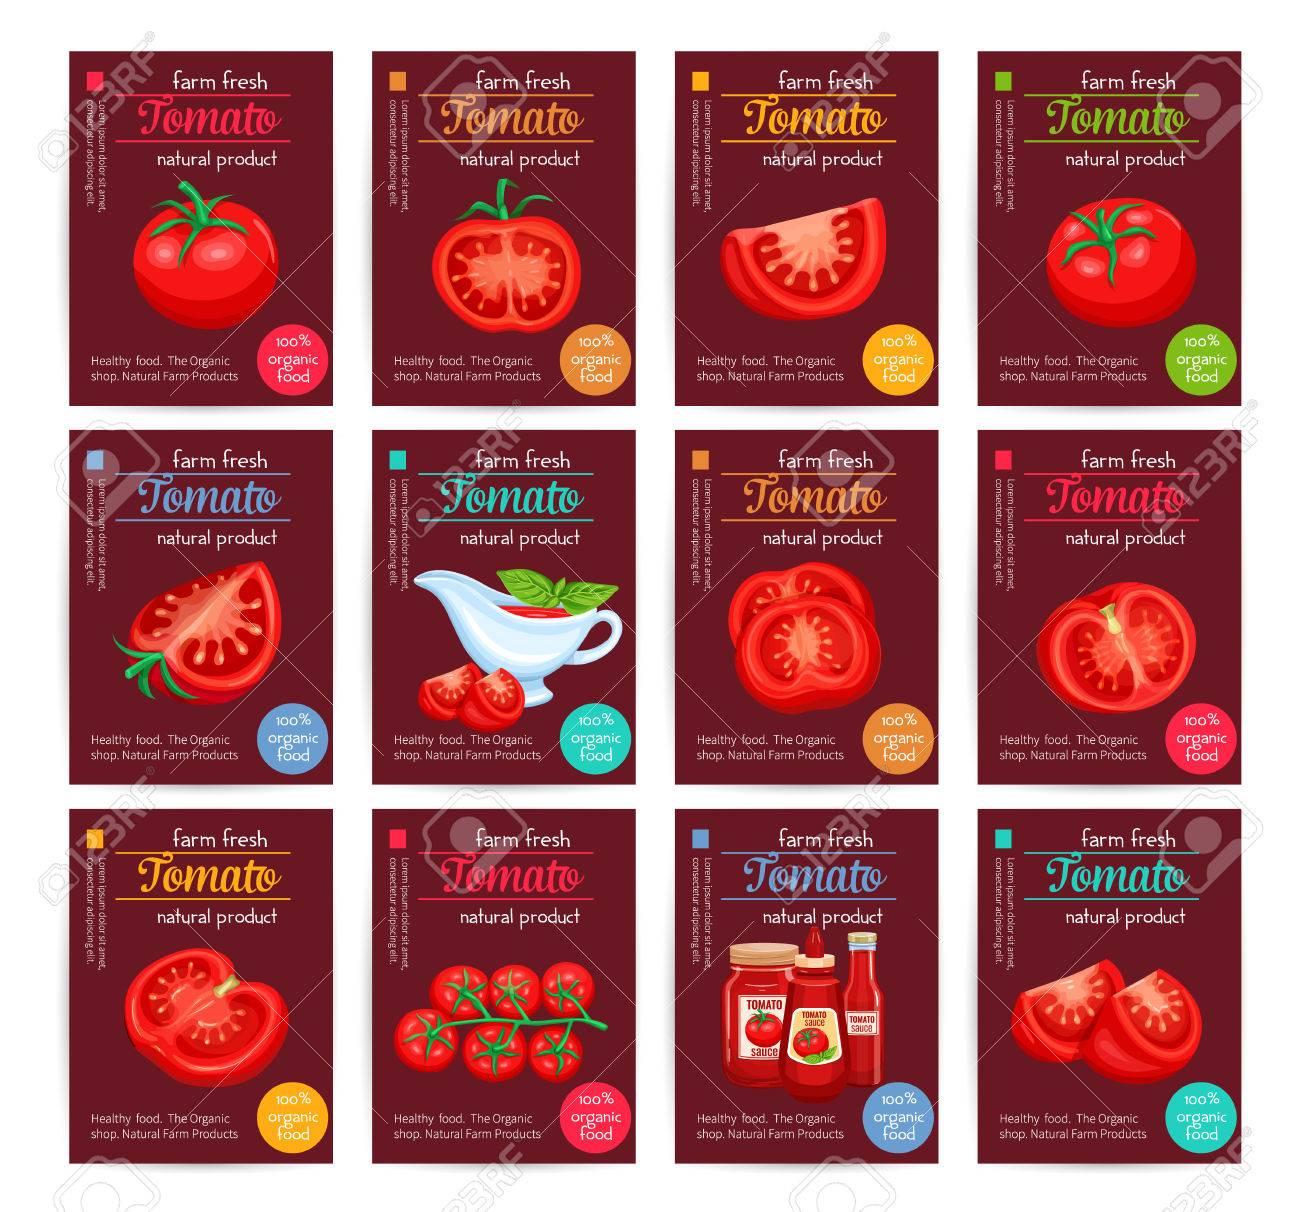 Tomato product sauce ketchup poster set. - 72172393